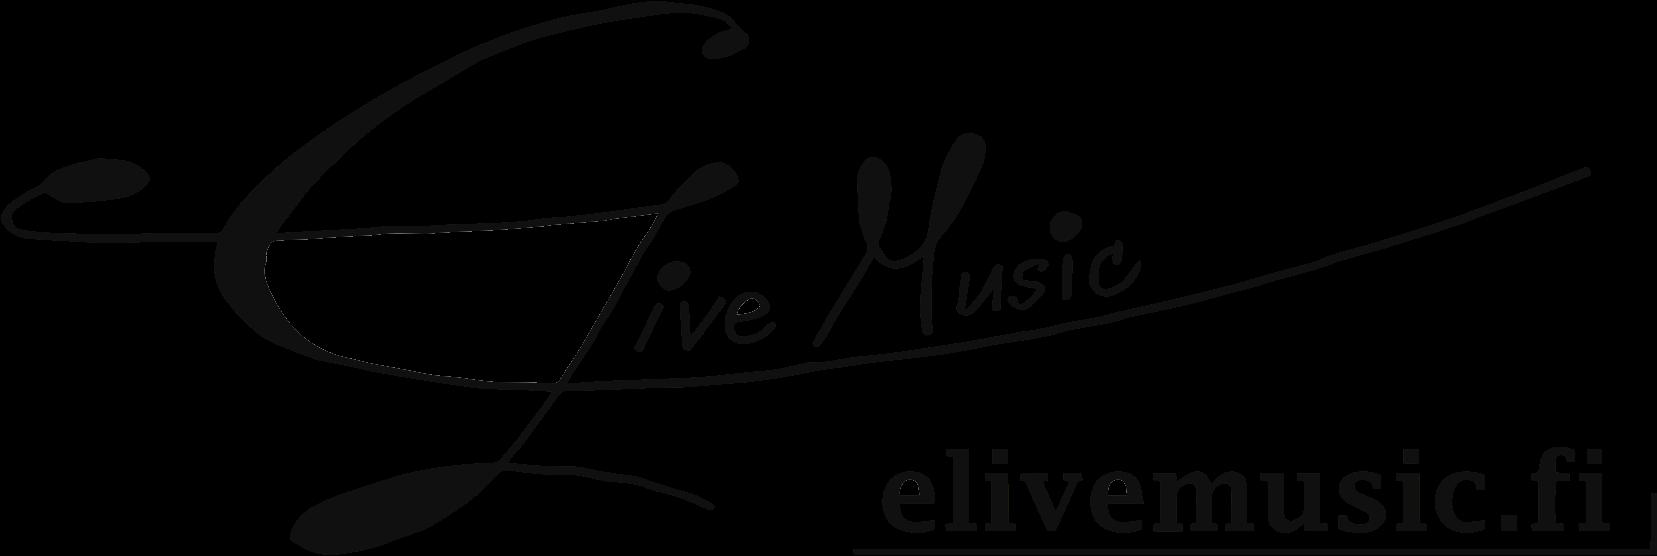 ELive Jazz